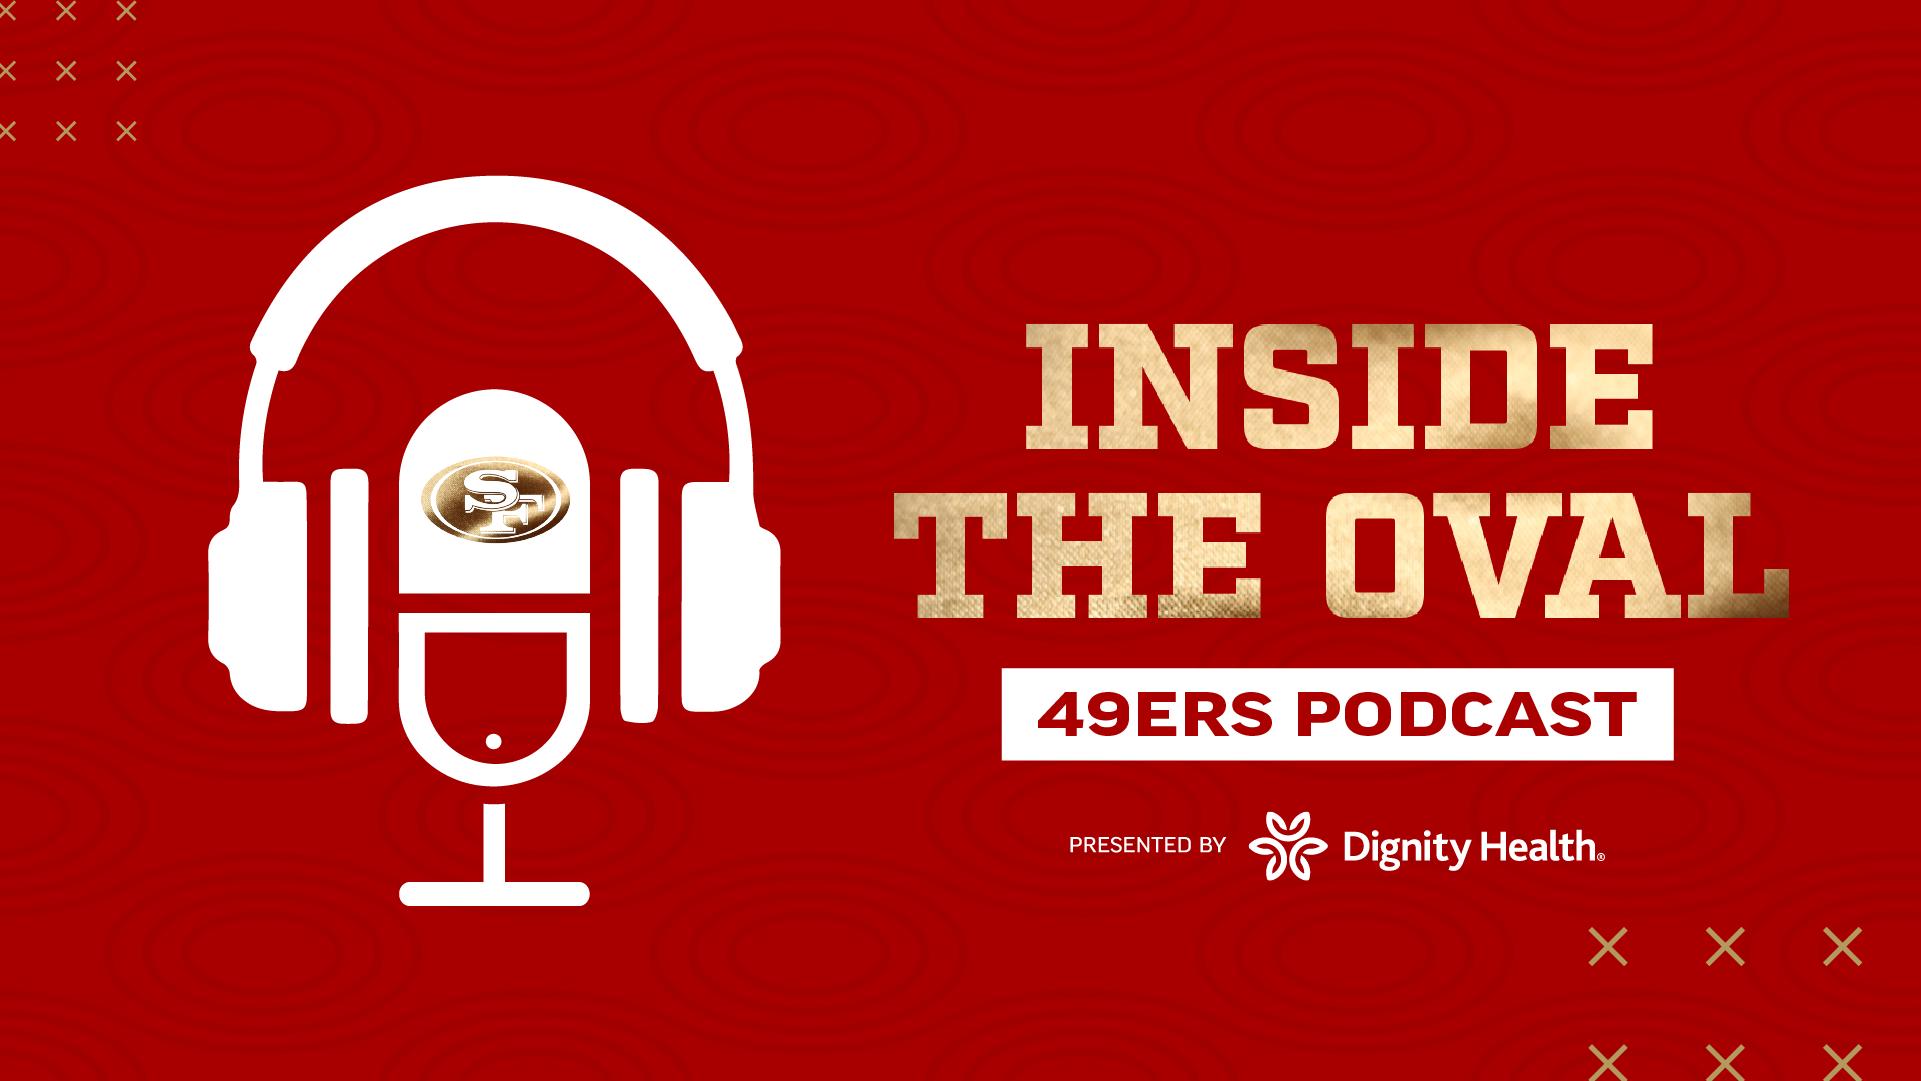 InsideTheOval 49ers Podcast_sponsor-02